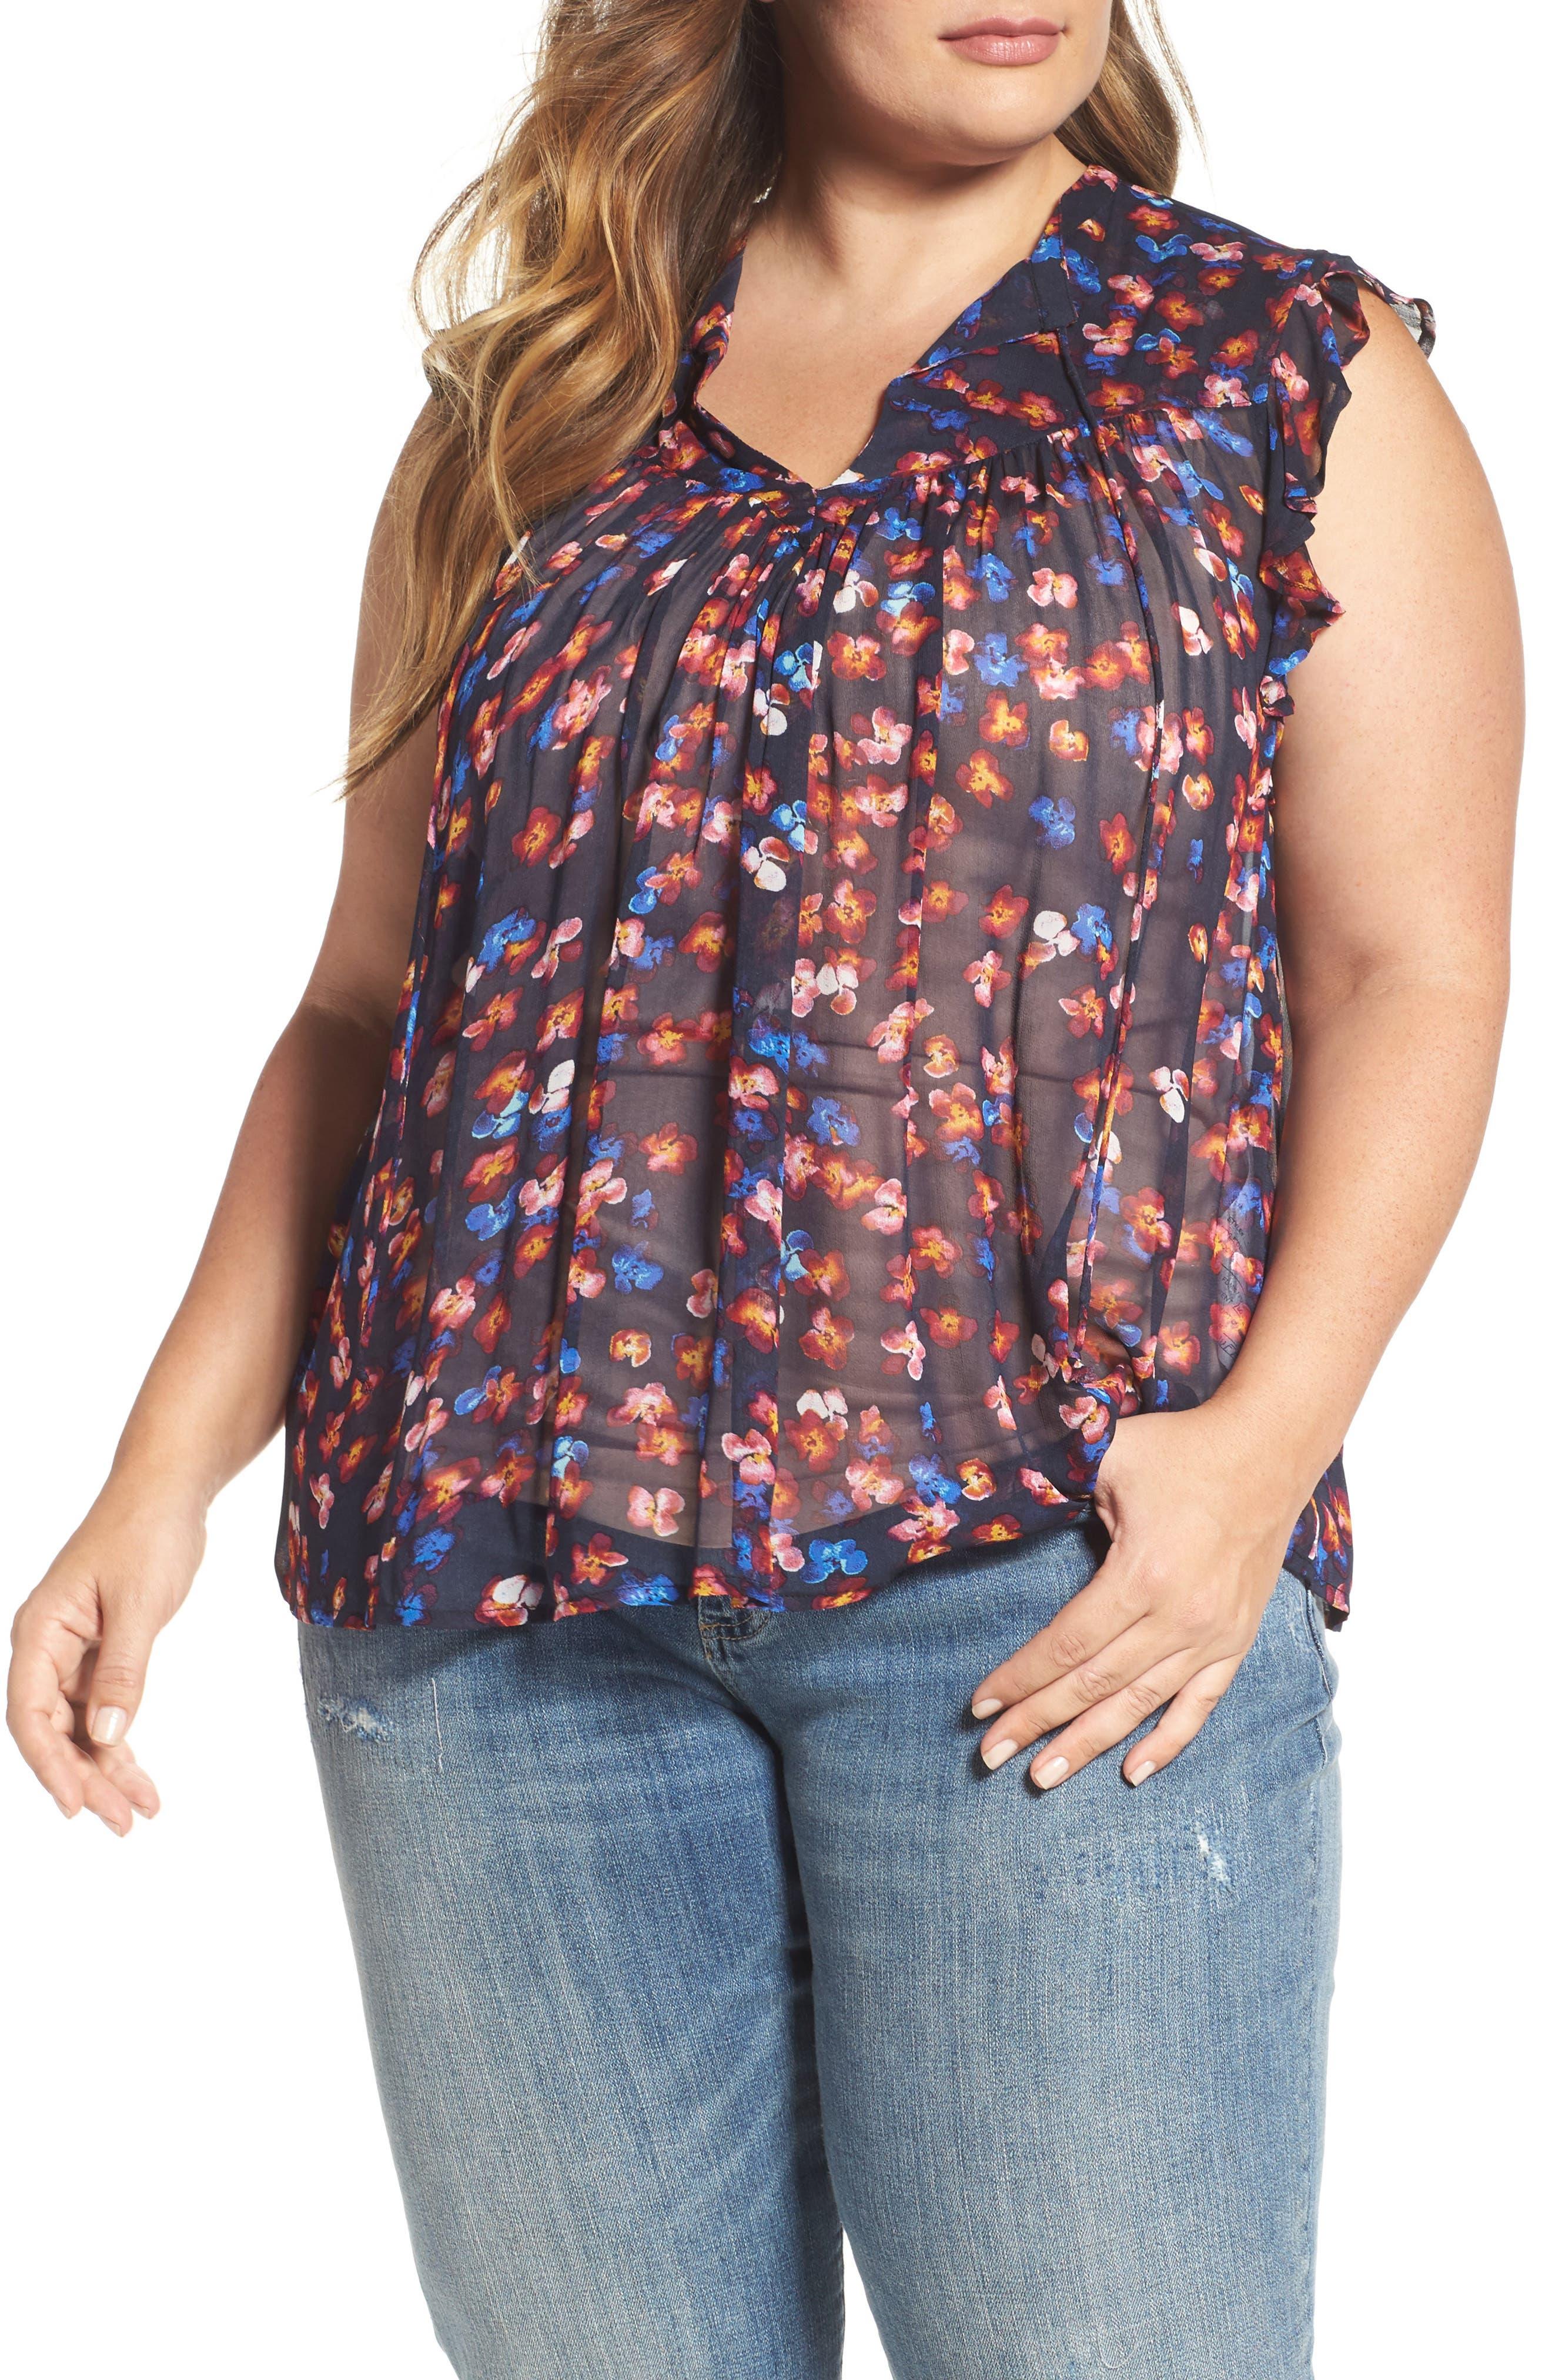 Main Image - Lucky Brand Ruffle Floral Chiffon Top (Plus Size)